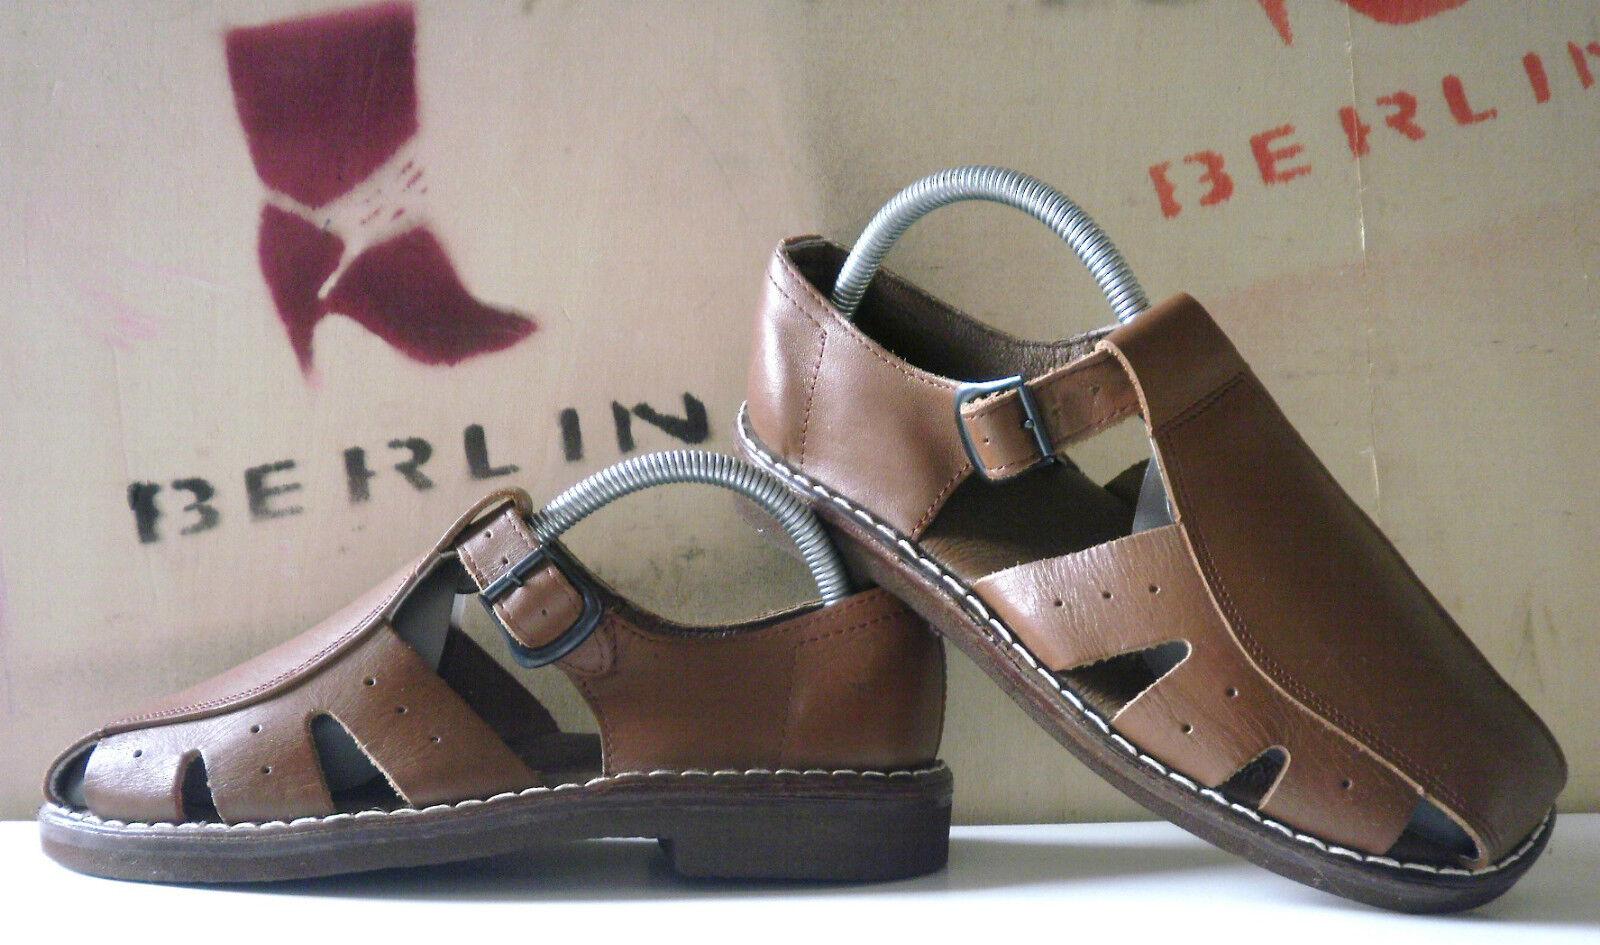 Nettuno Sandalo Uomo Scarpe 70er True Vintage 70s Scarpe da Bagno Estate Scarpe NOS